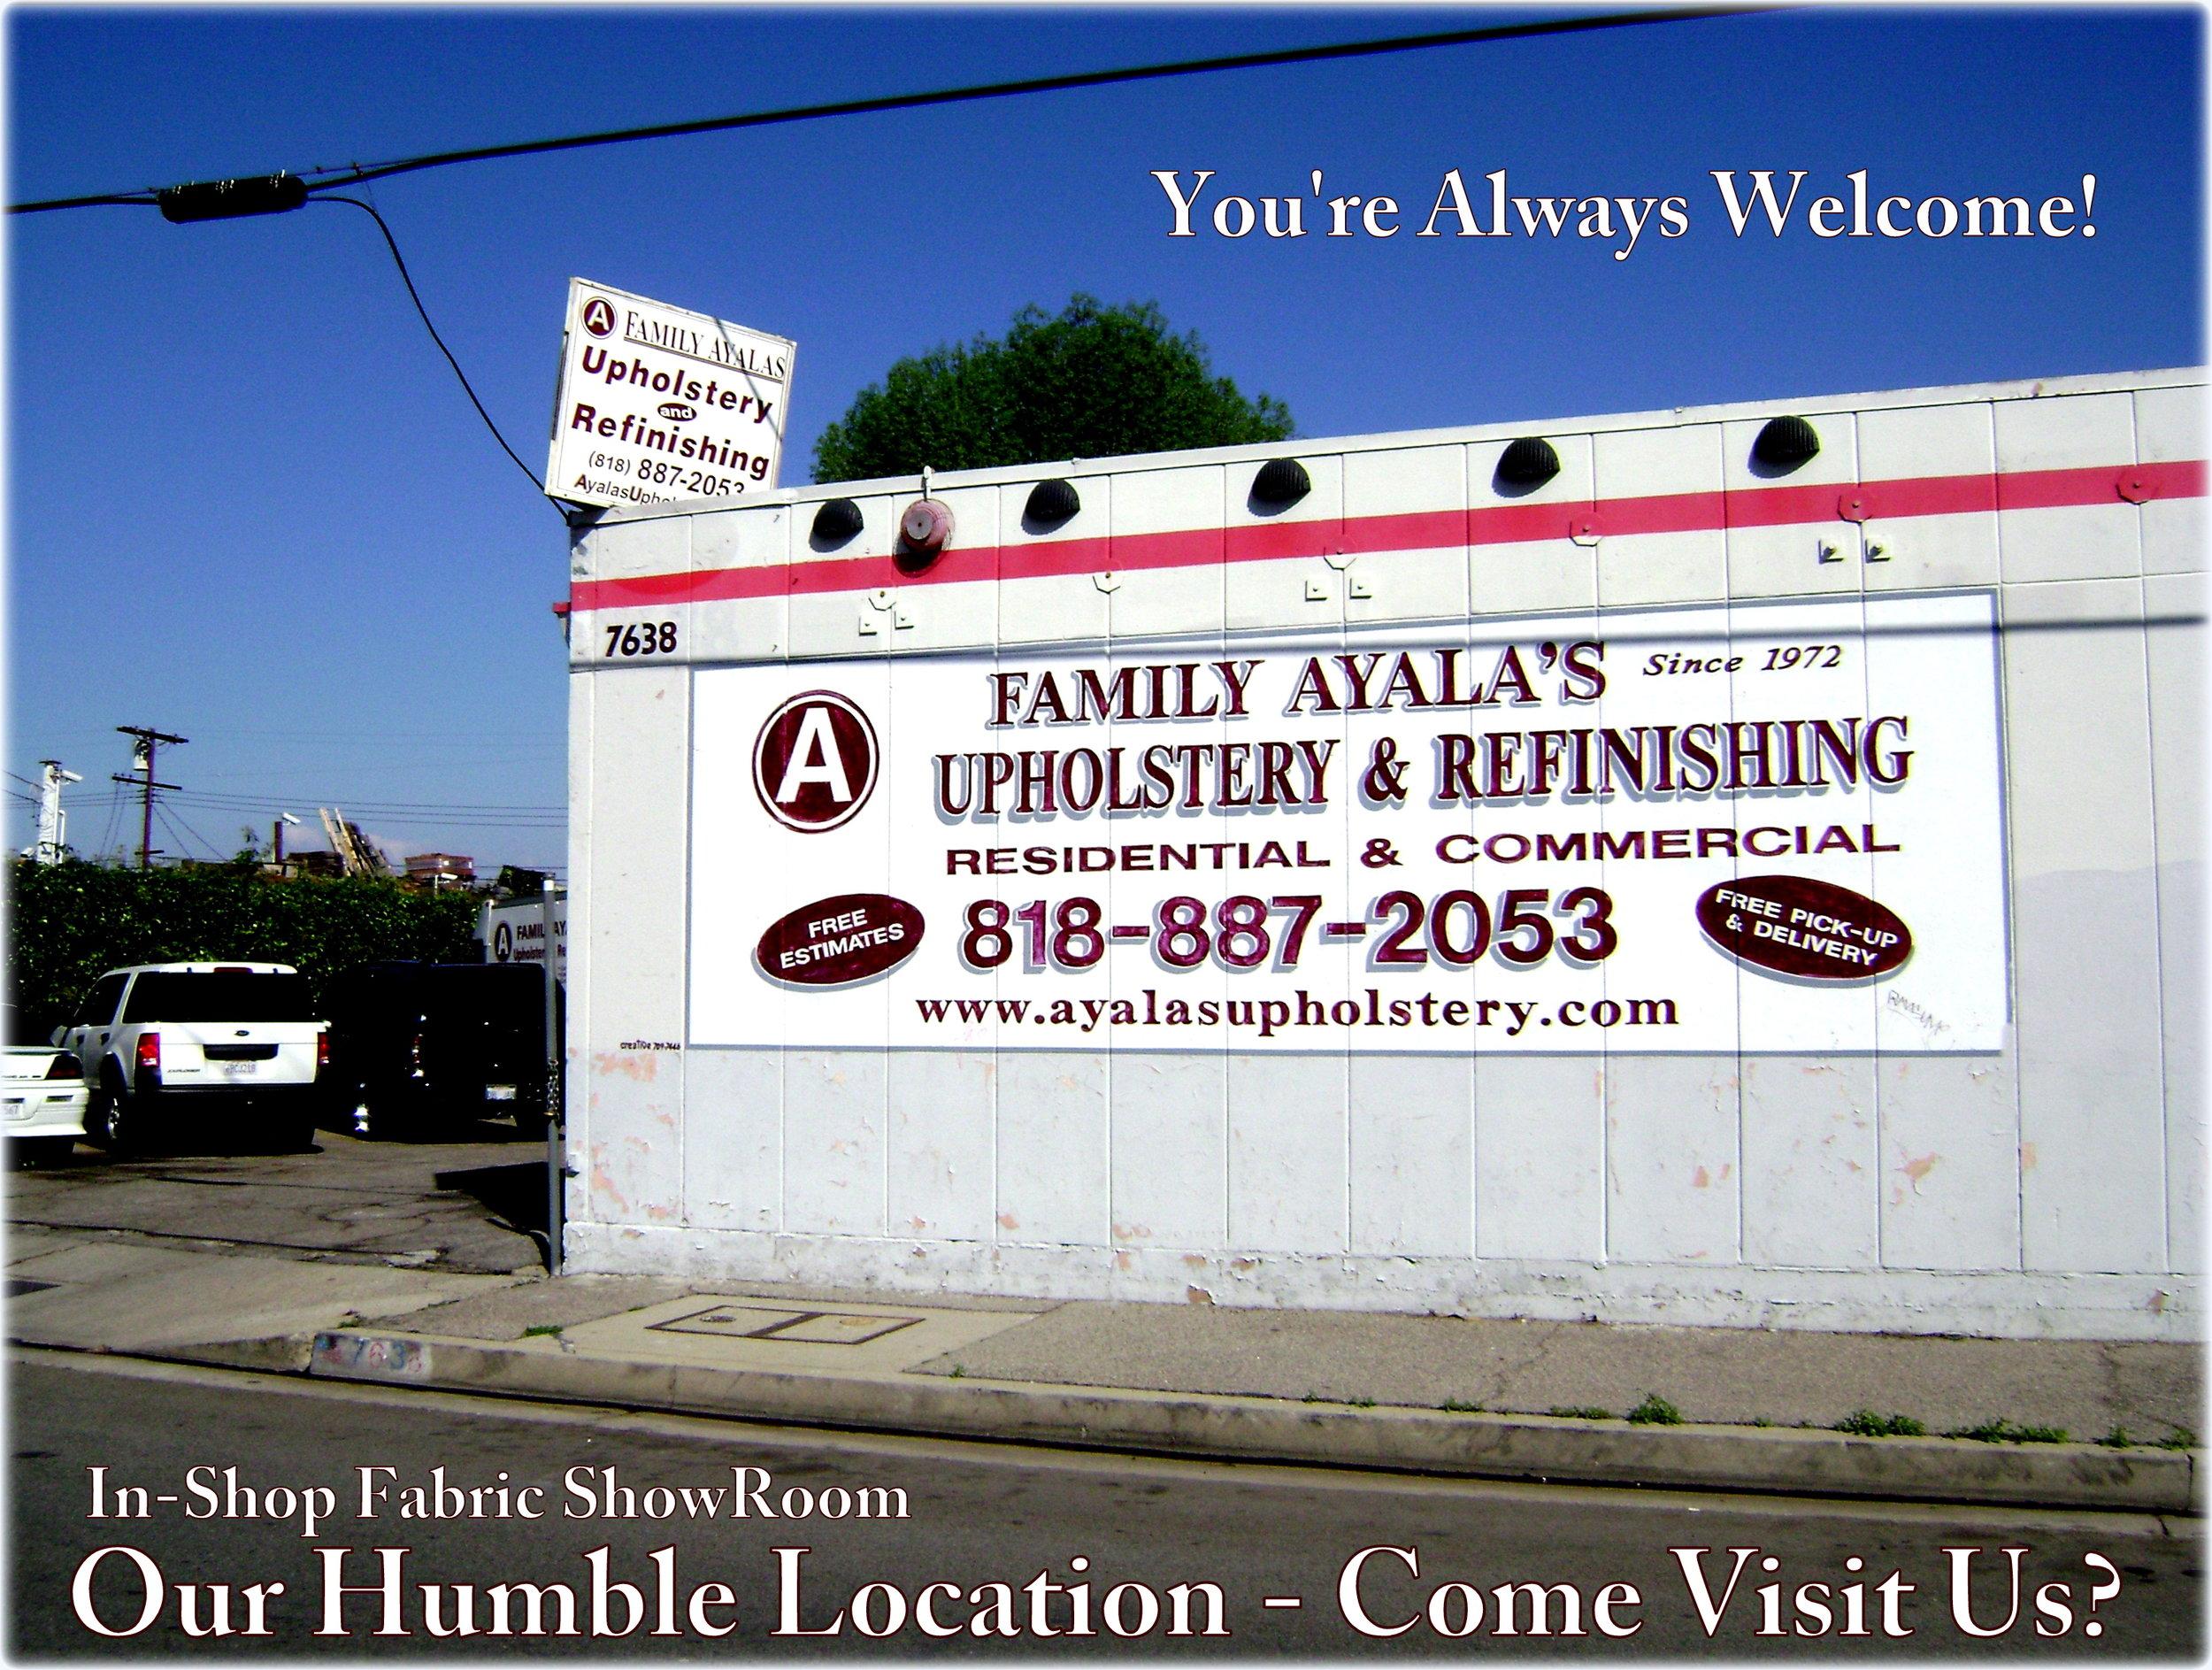 ayalas upholstery addresss location.jpg